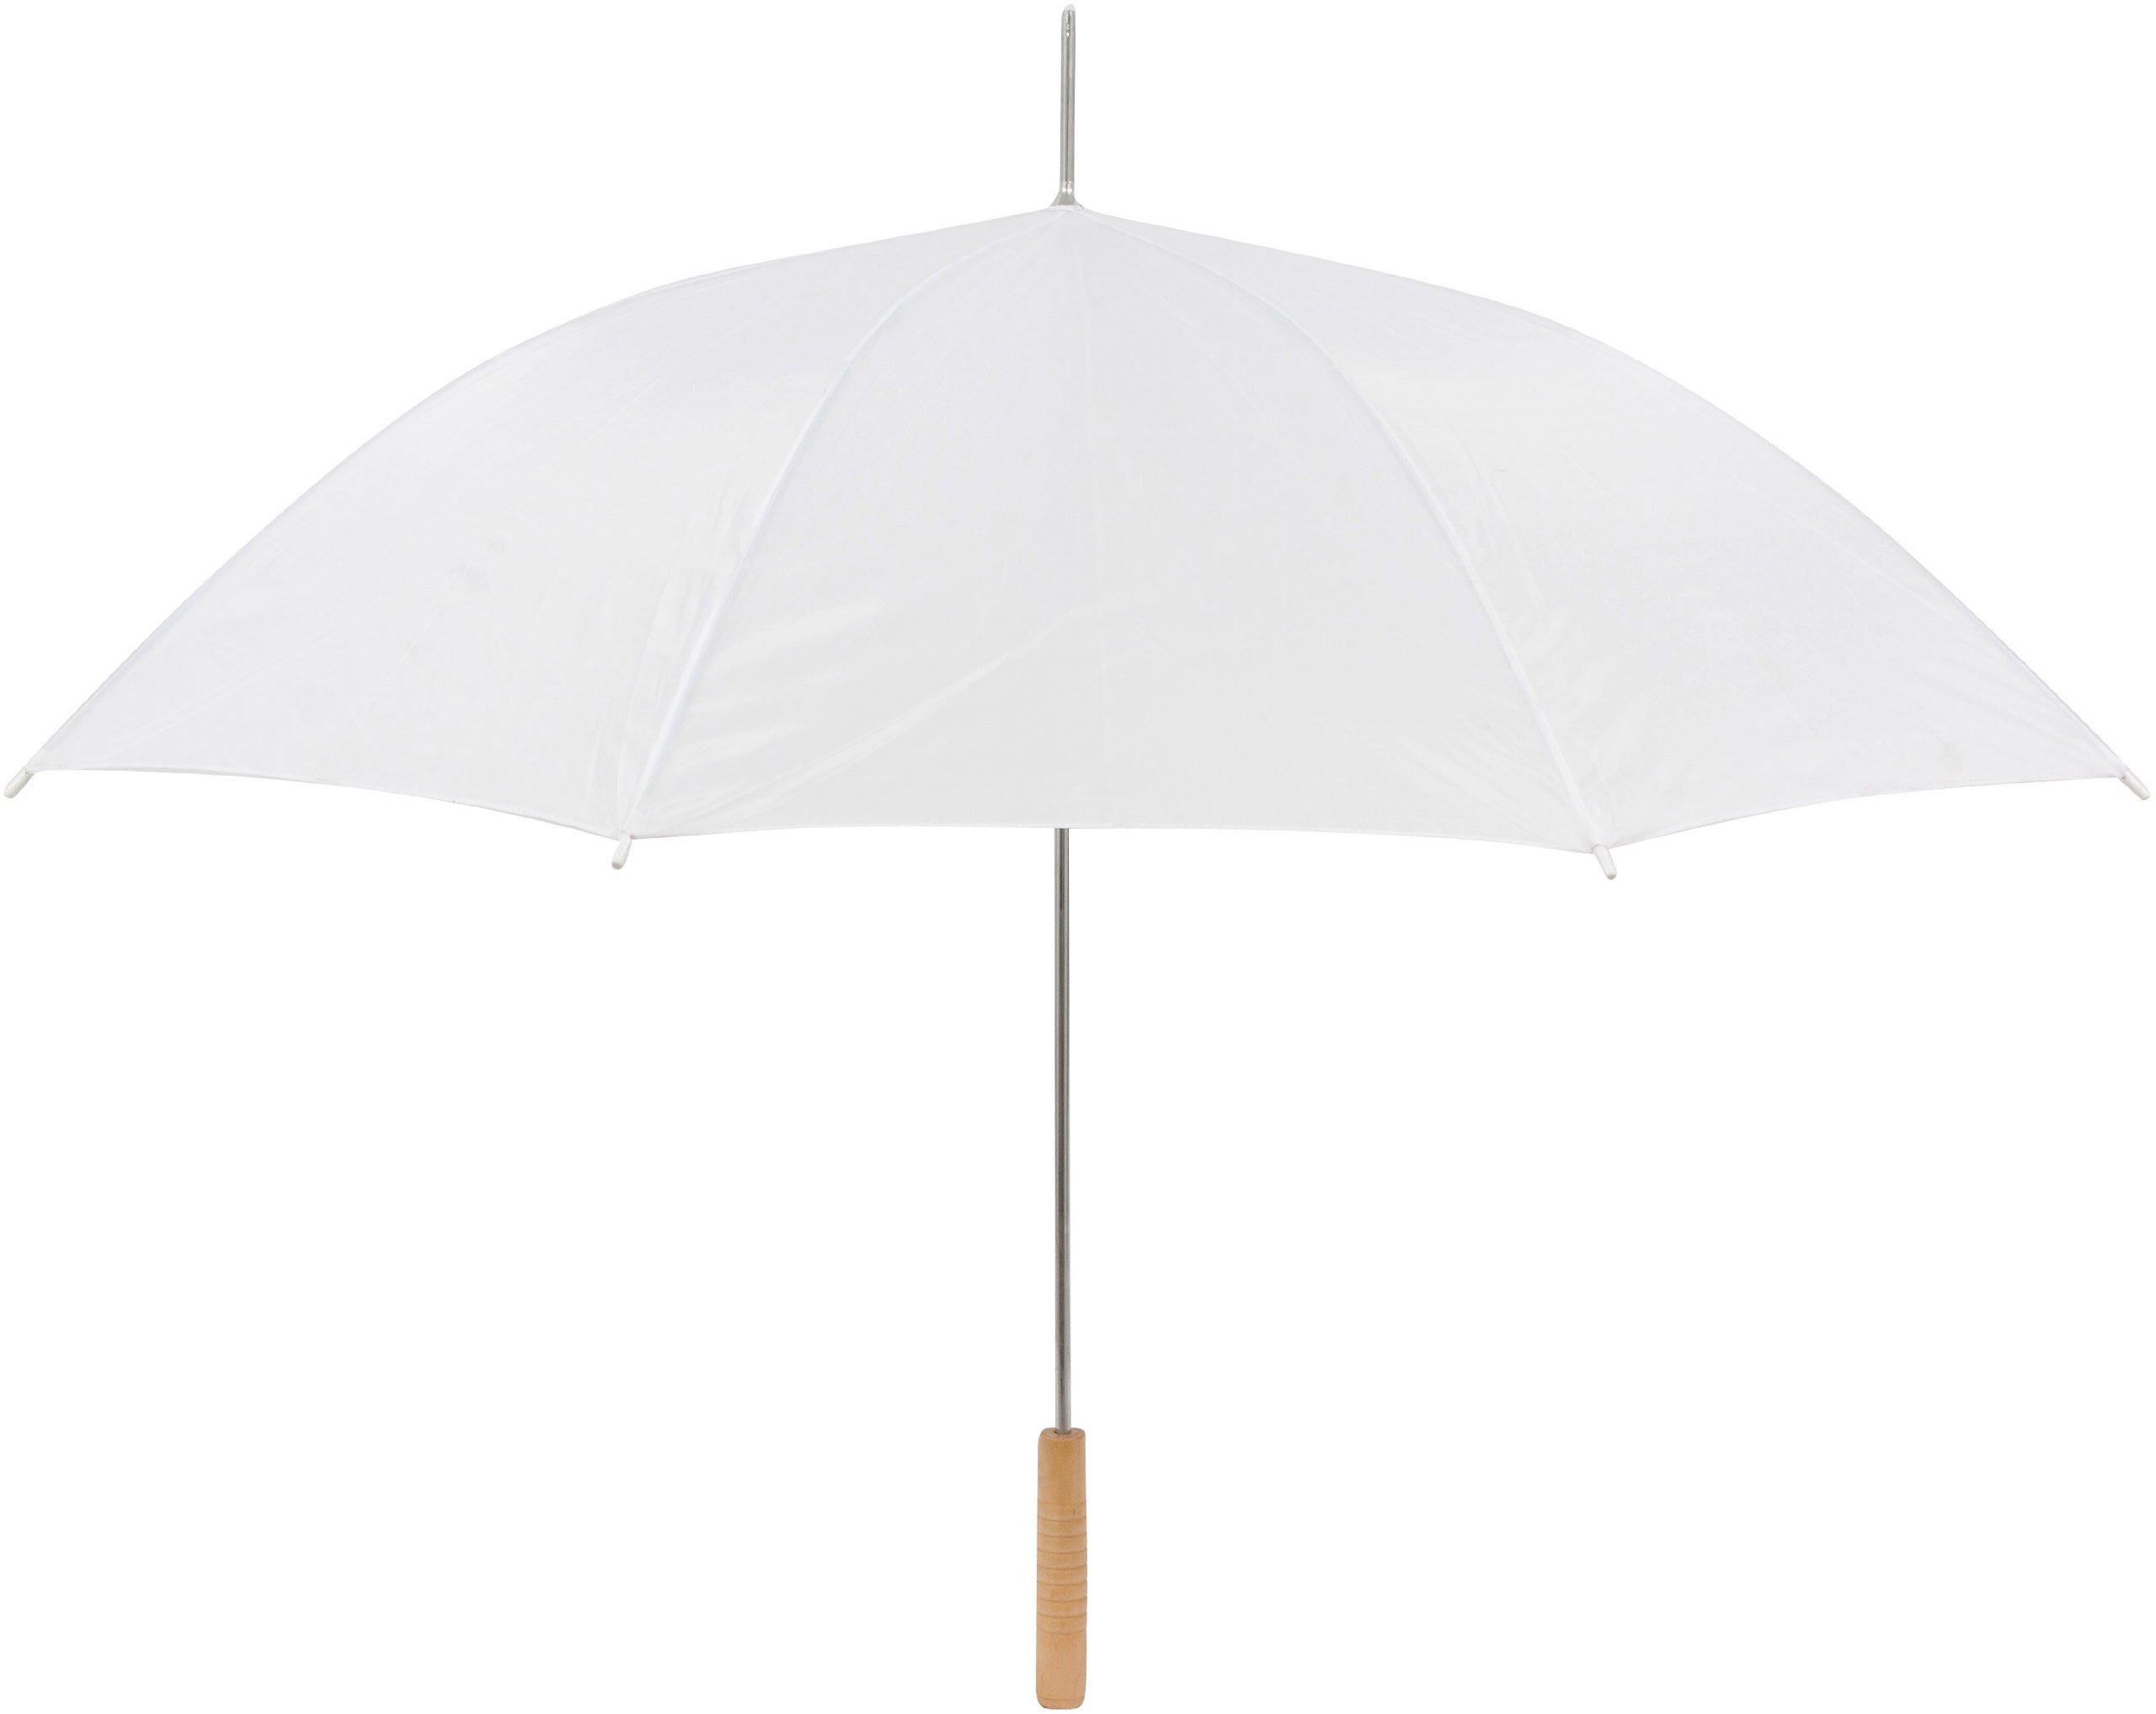 Wedding Umbrella - 60'' Umbrella  - Manual Open By Anderson Umbrella (White)